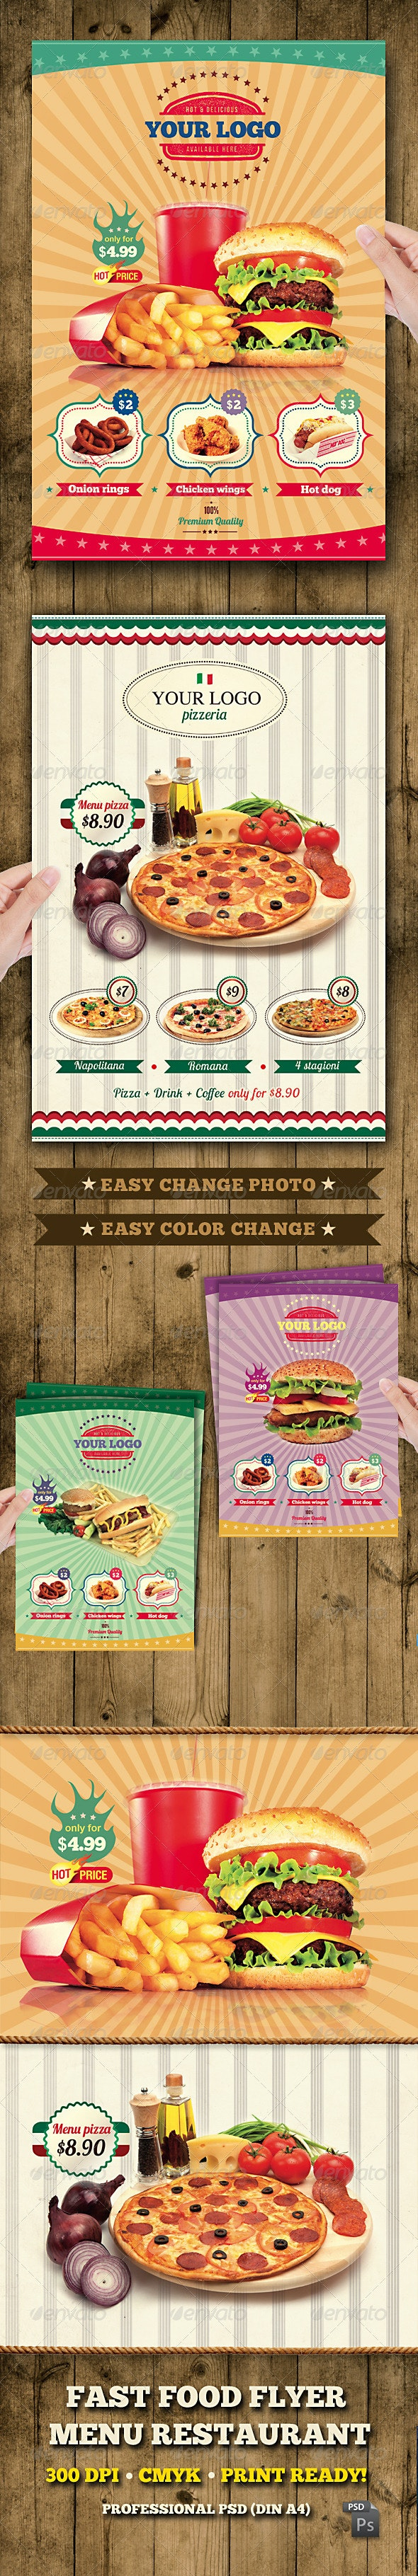 Fast Food Flyer Menu Restaurant A4 - Restaurant Flyers